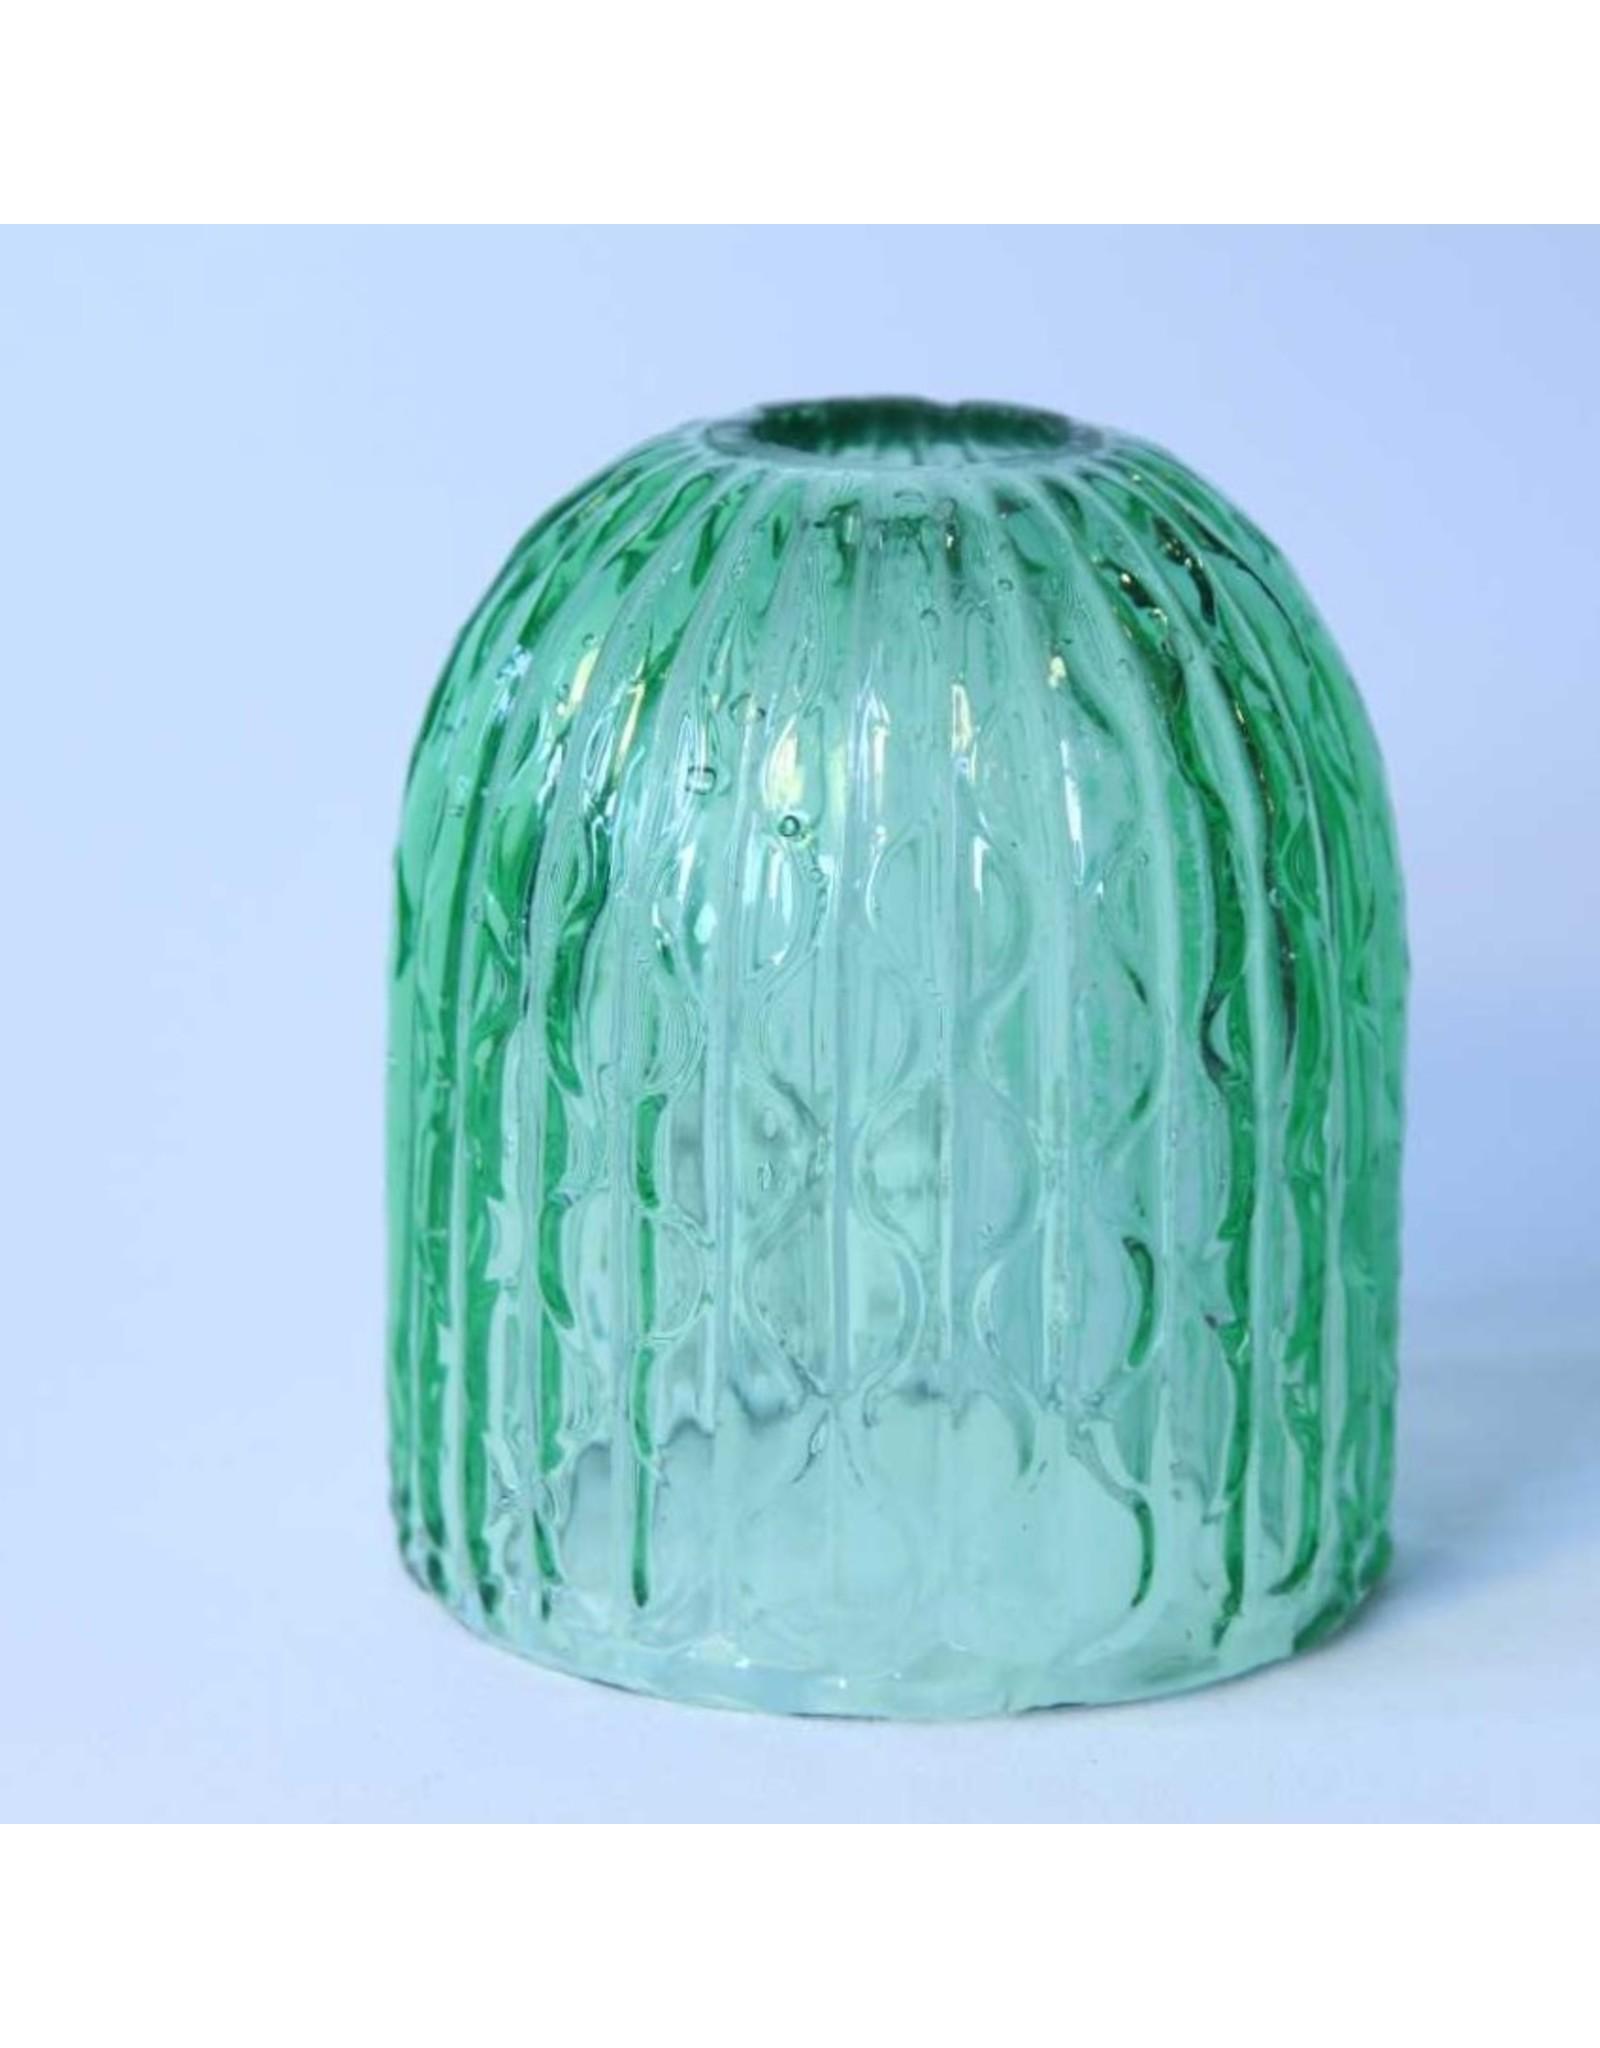 Fairy lamp shade - Victorian, green, bubbles, glass